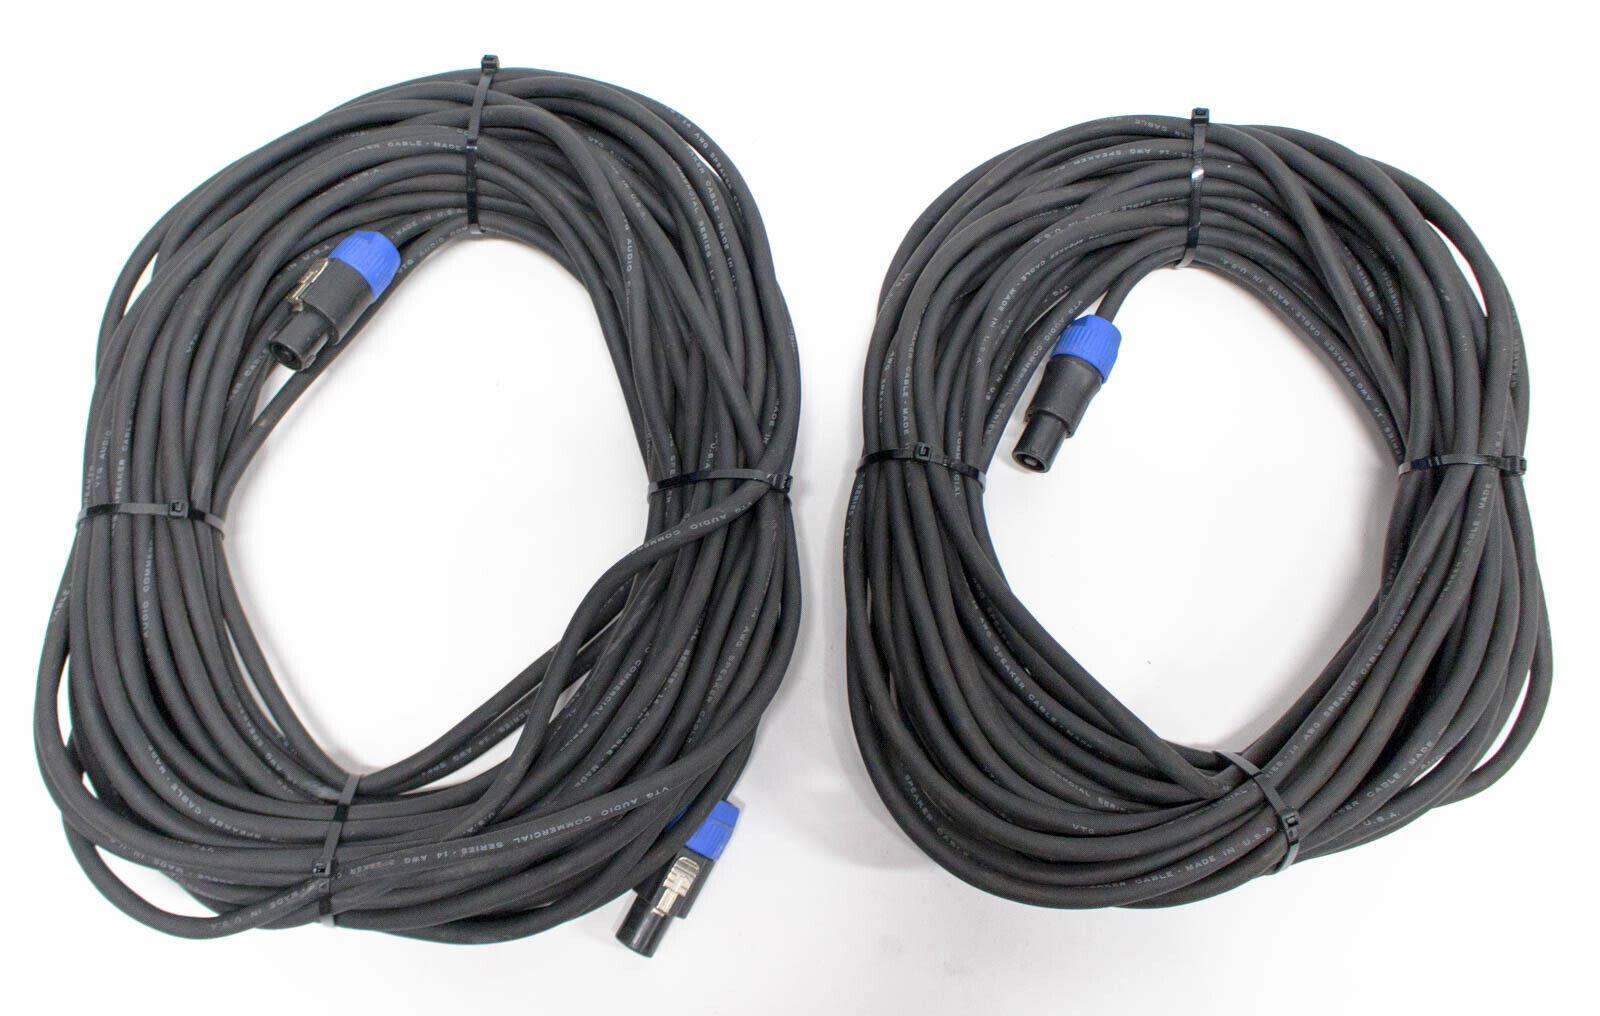 Neutrik NL4FC Speakon to Speakon Cable - 70ft - Set of 2